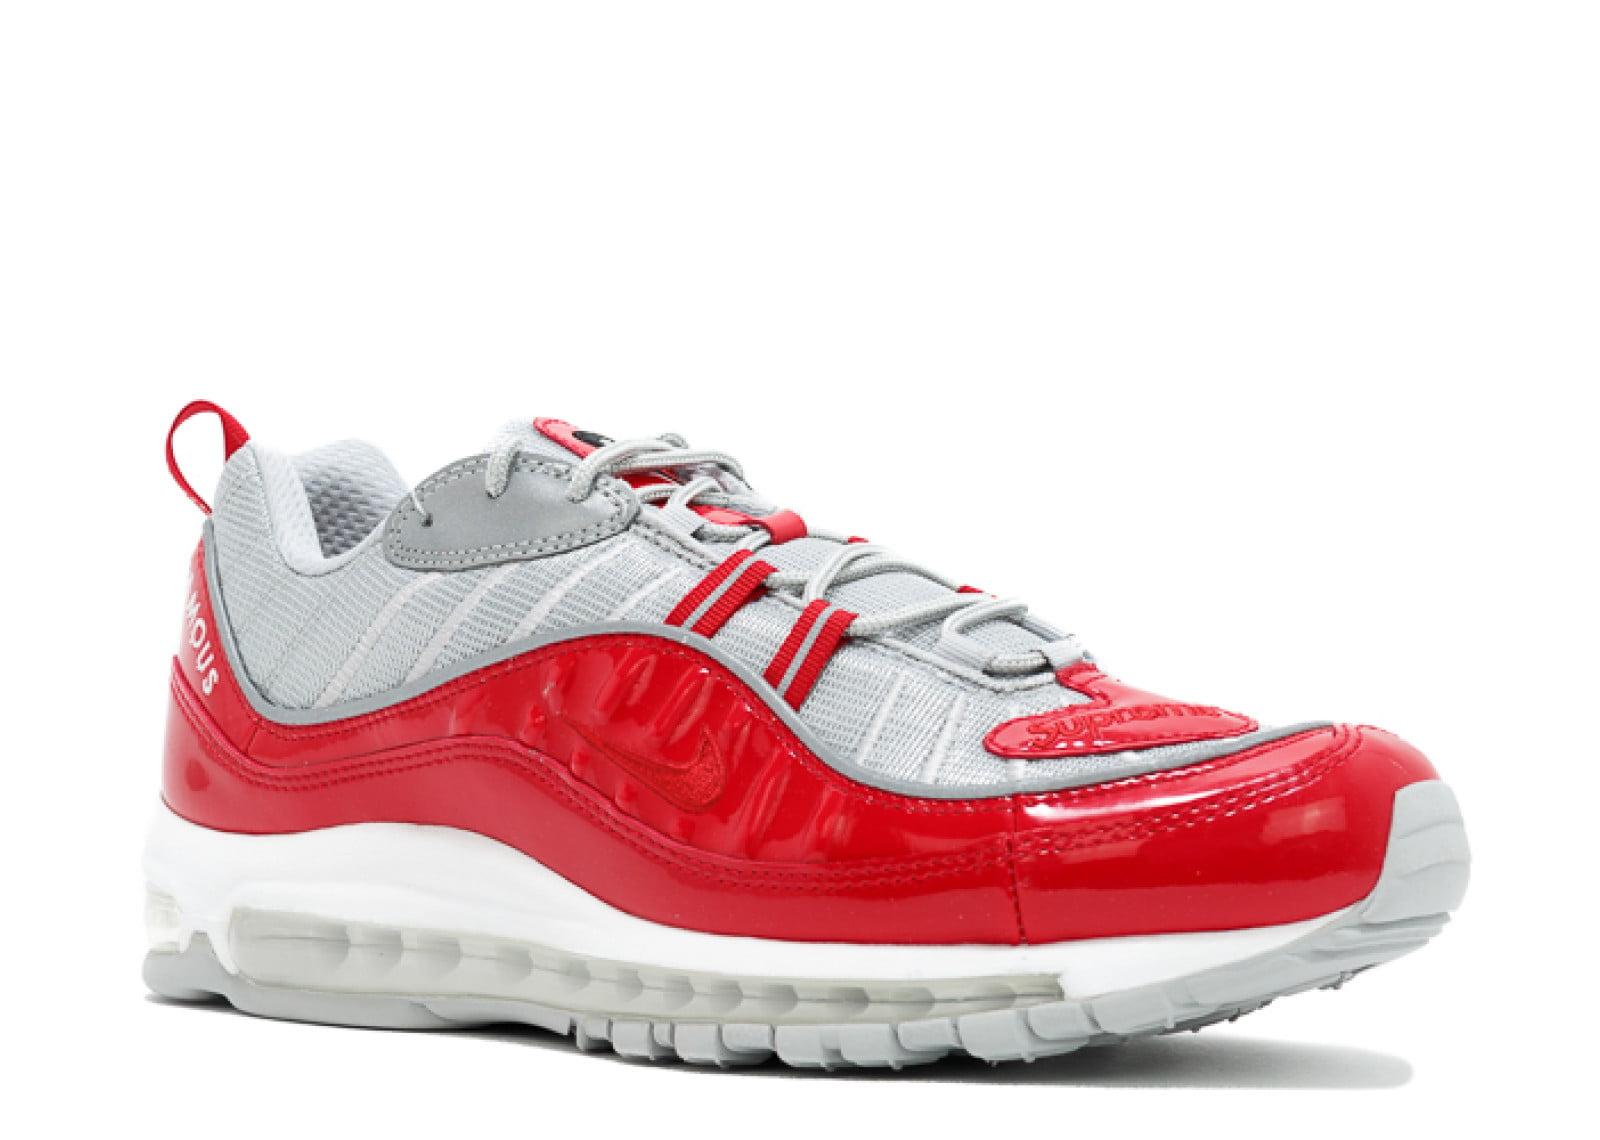 best service d6bc3 350a4 Nike - Men - Air Max 98   Supreme  Supreme  - 844694-600 - Size 10.5